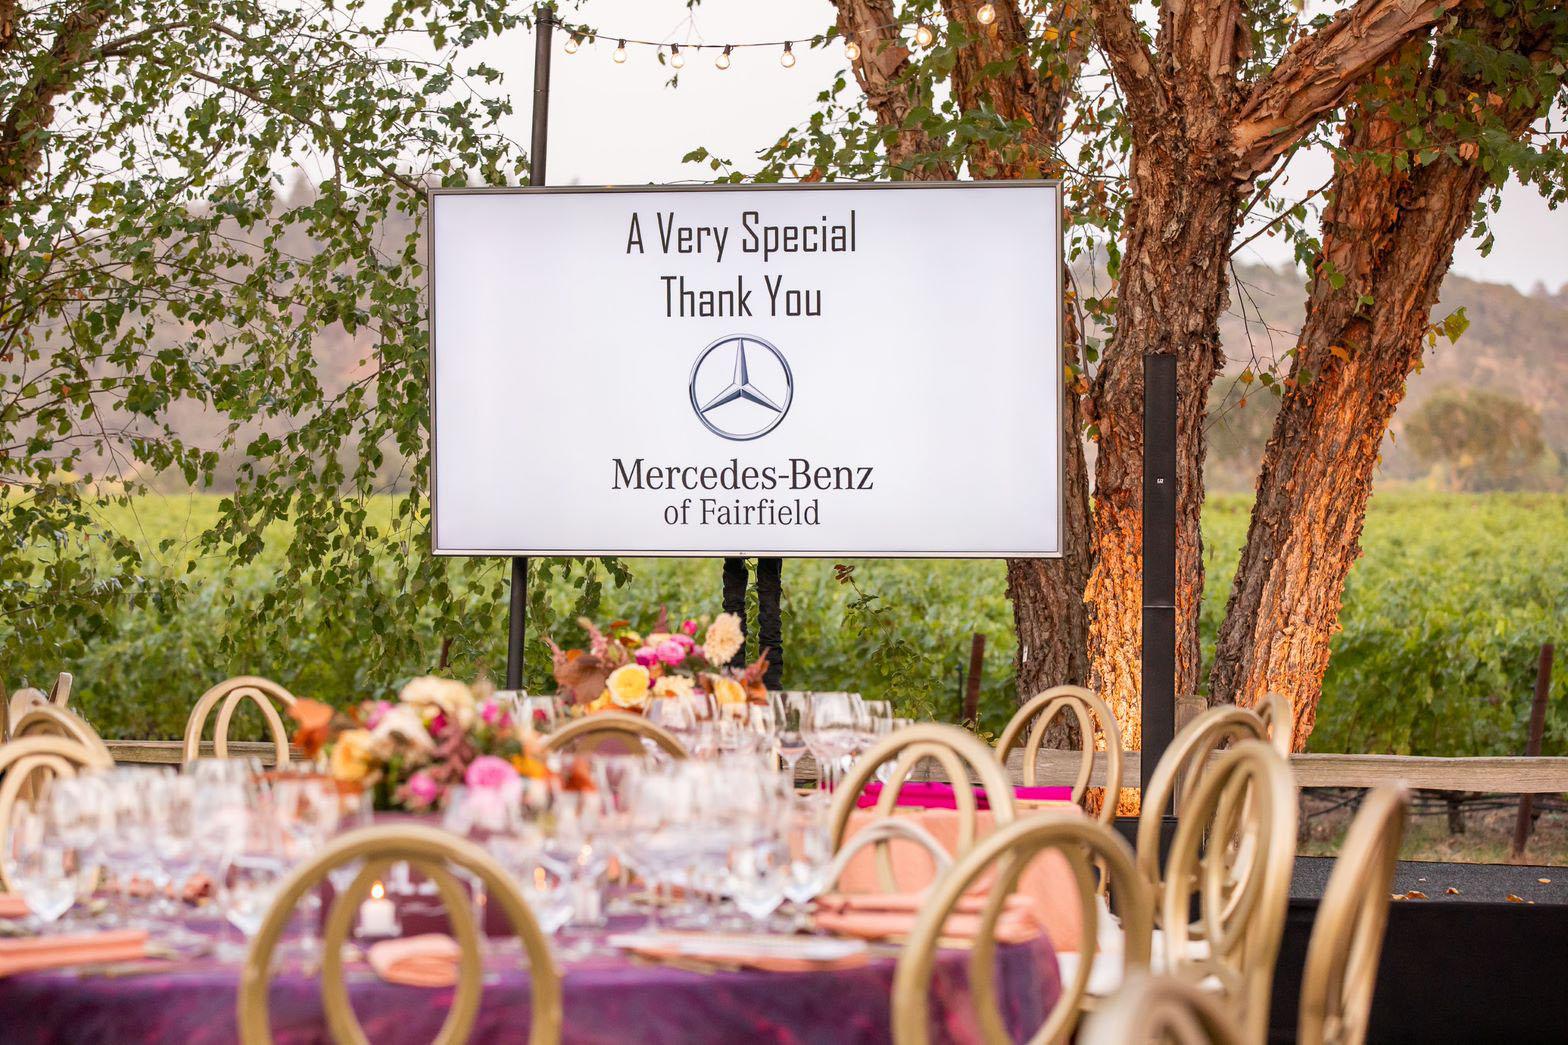 Mercedes sponsorship table